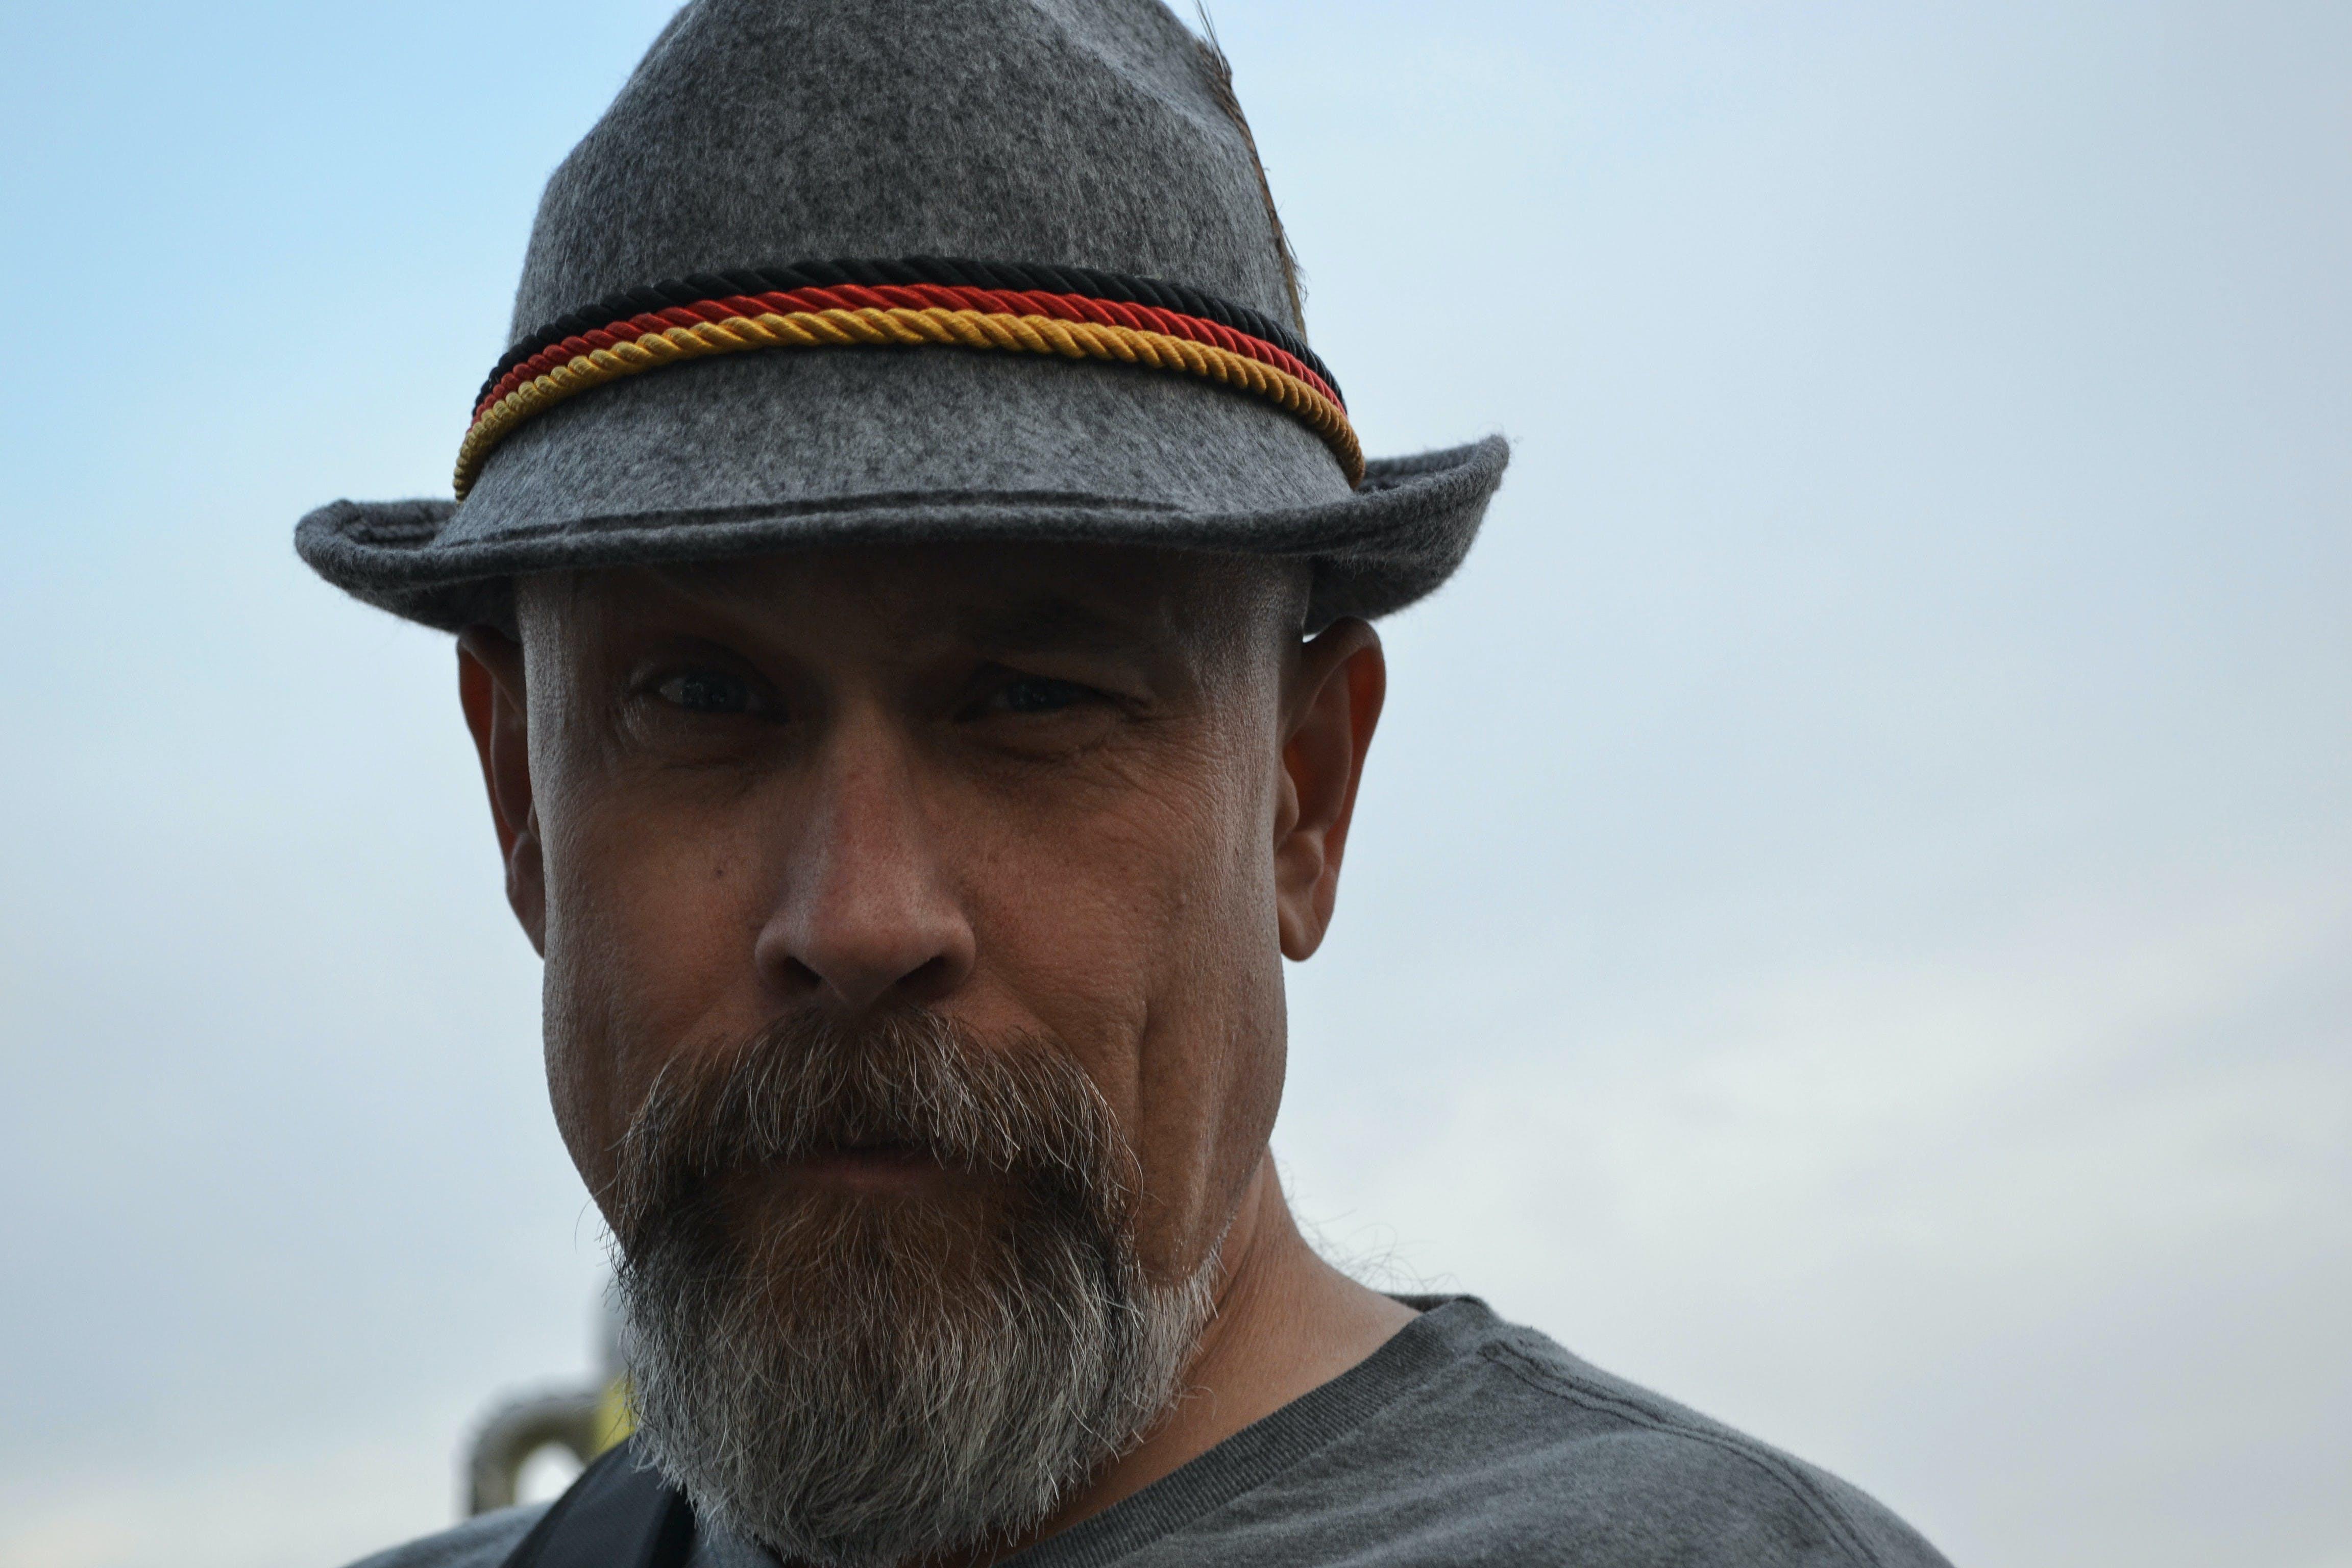 Man Wearing Hat Taking Selfie